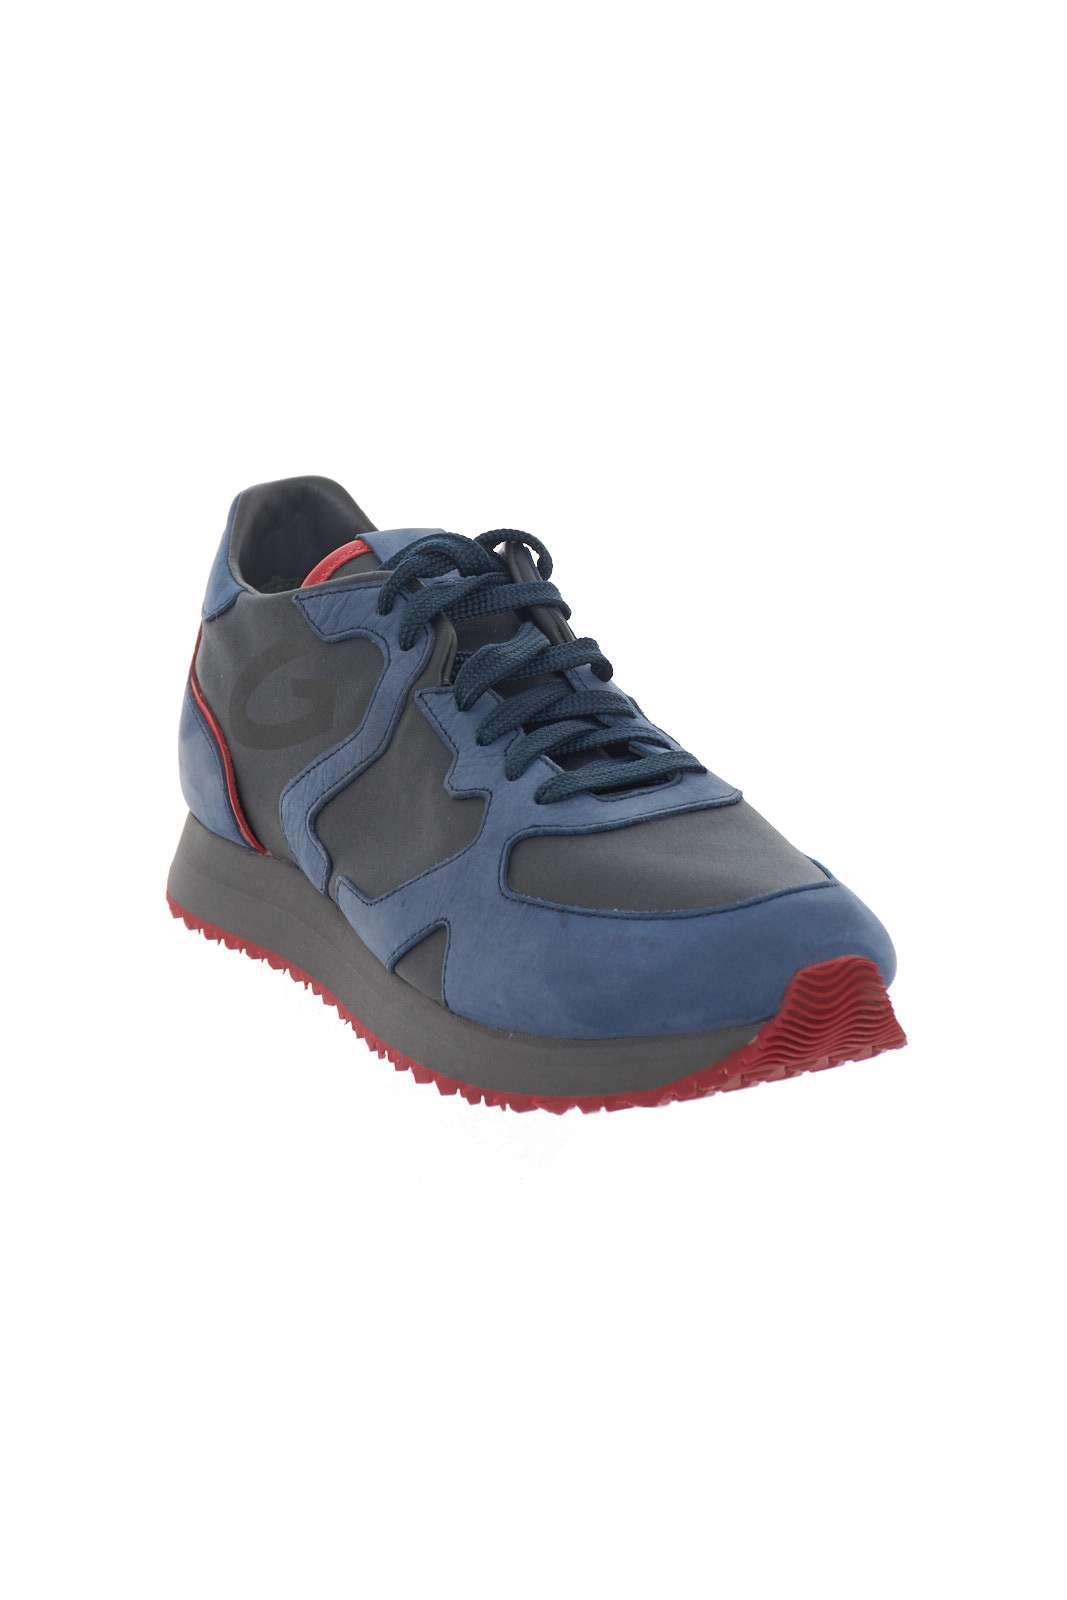 https://www.parmax.com/media/catalog/product/a/i/AI-outlet_parmax-scarpe-uomo-Guardiani-Sport-SU71391C-D.jpg